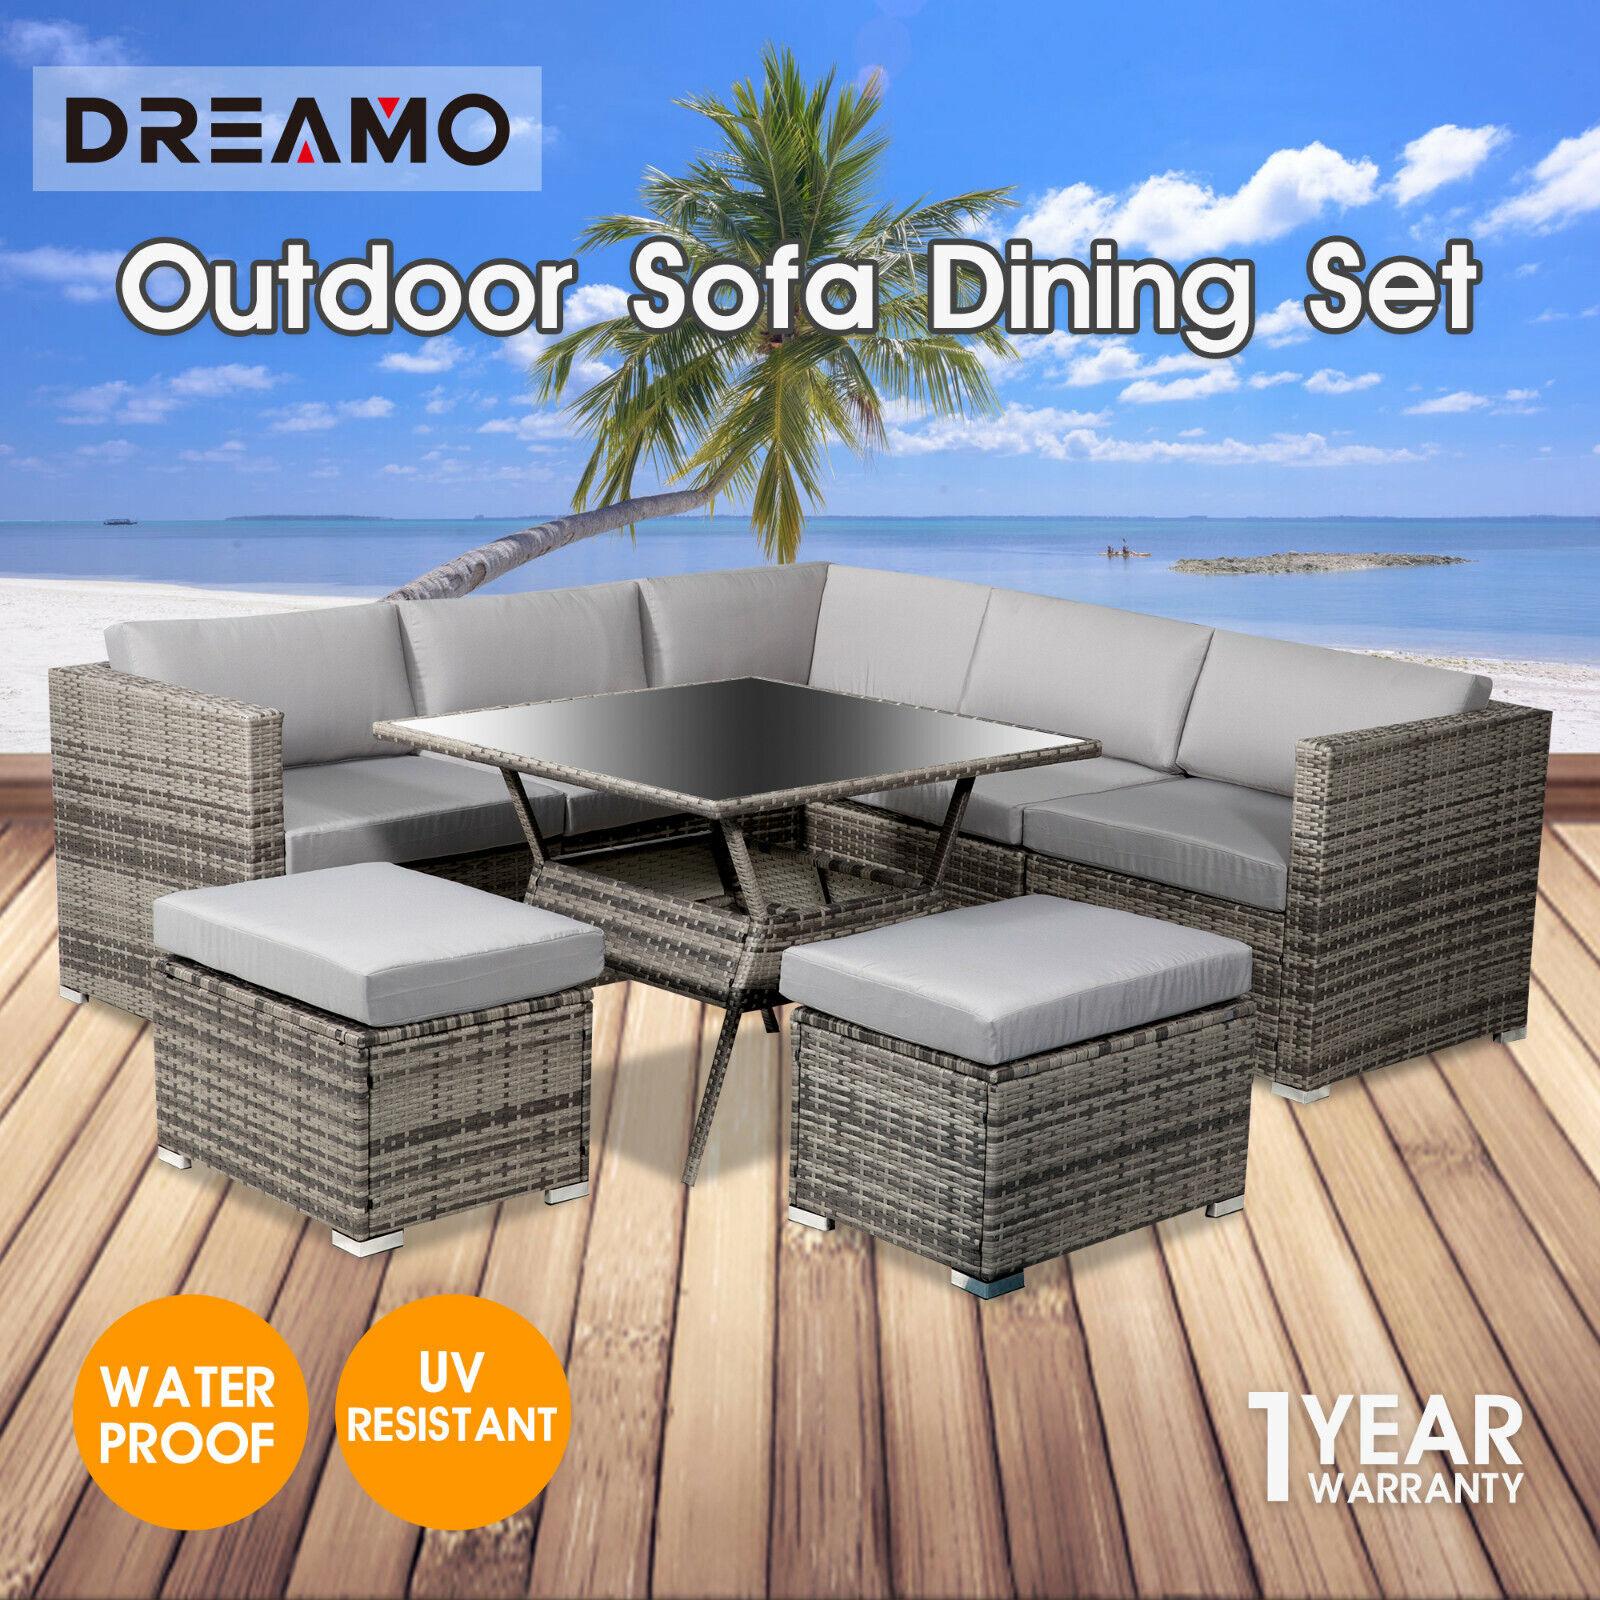 Garden Furniture - 8 Seater Outdoor Dining Furniture Set Wicker Table Chairs Garden